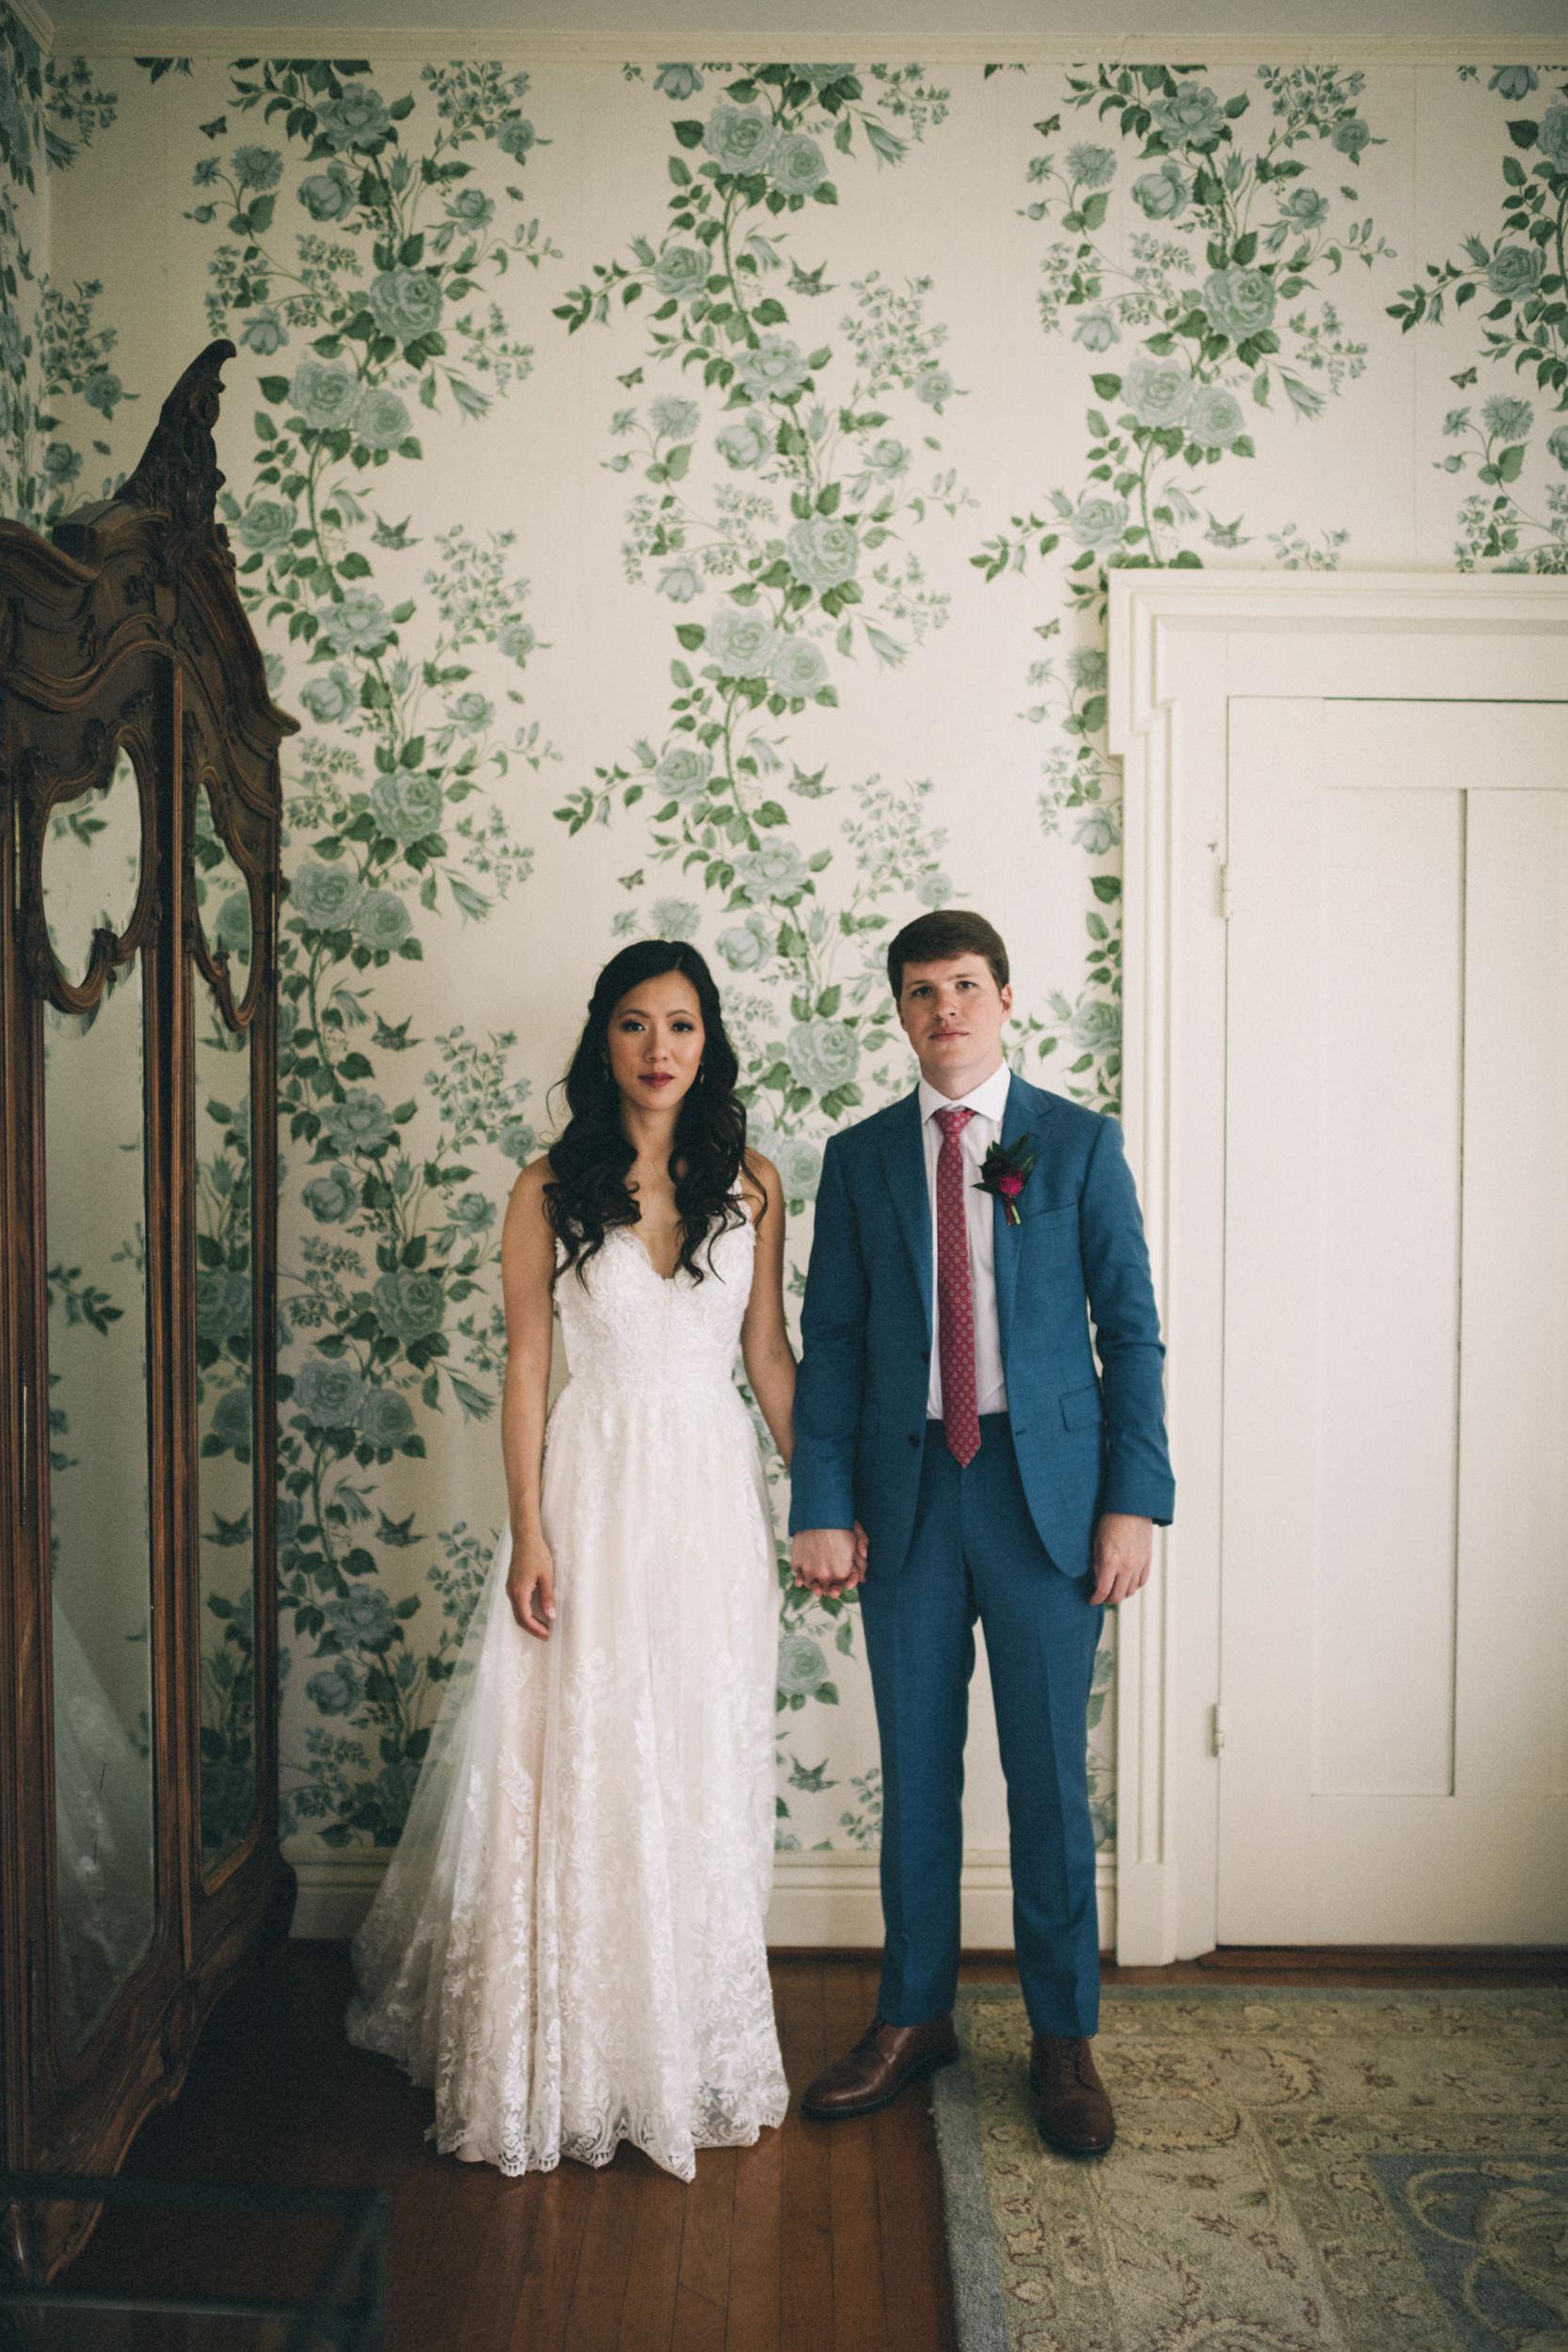 Louisville-Kentucky-Wedding-and-Elopement-Photographer-Sarah-Katherine-Davis-Photography-Summer-Jewel-Toned-Wedding-Chineese-Tea-Ceremony-Warrenwood-Manor-Danville-231.jpg